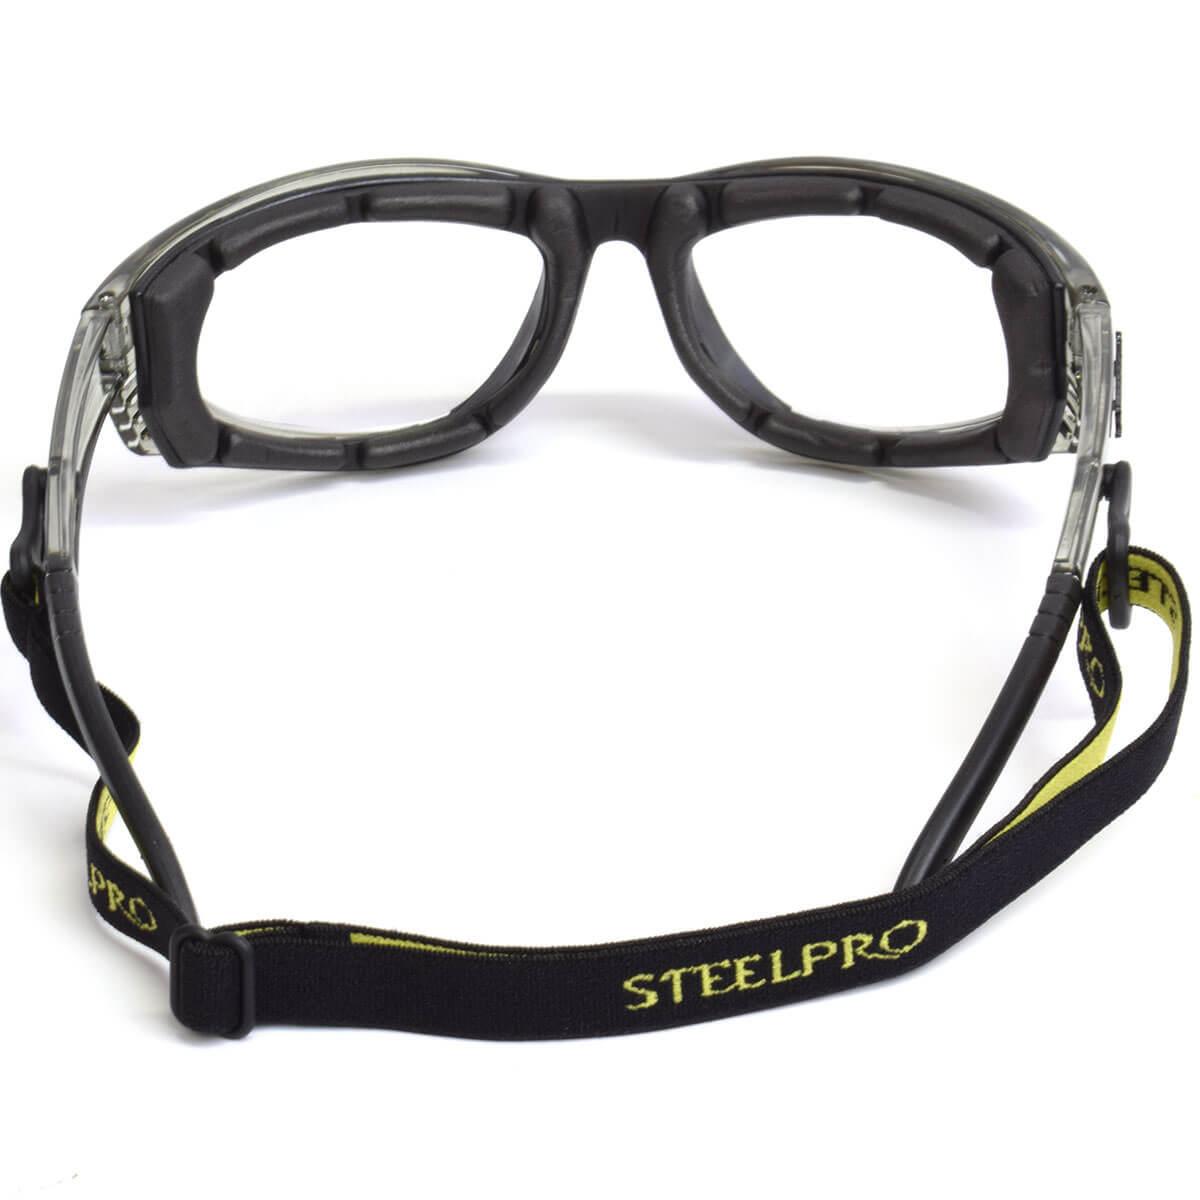 a213f675c98ac Óculos de Segurança Lente Incolor Turbine Steelpro VIC58110 Vicsa